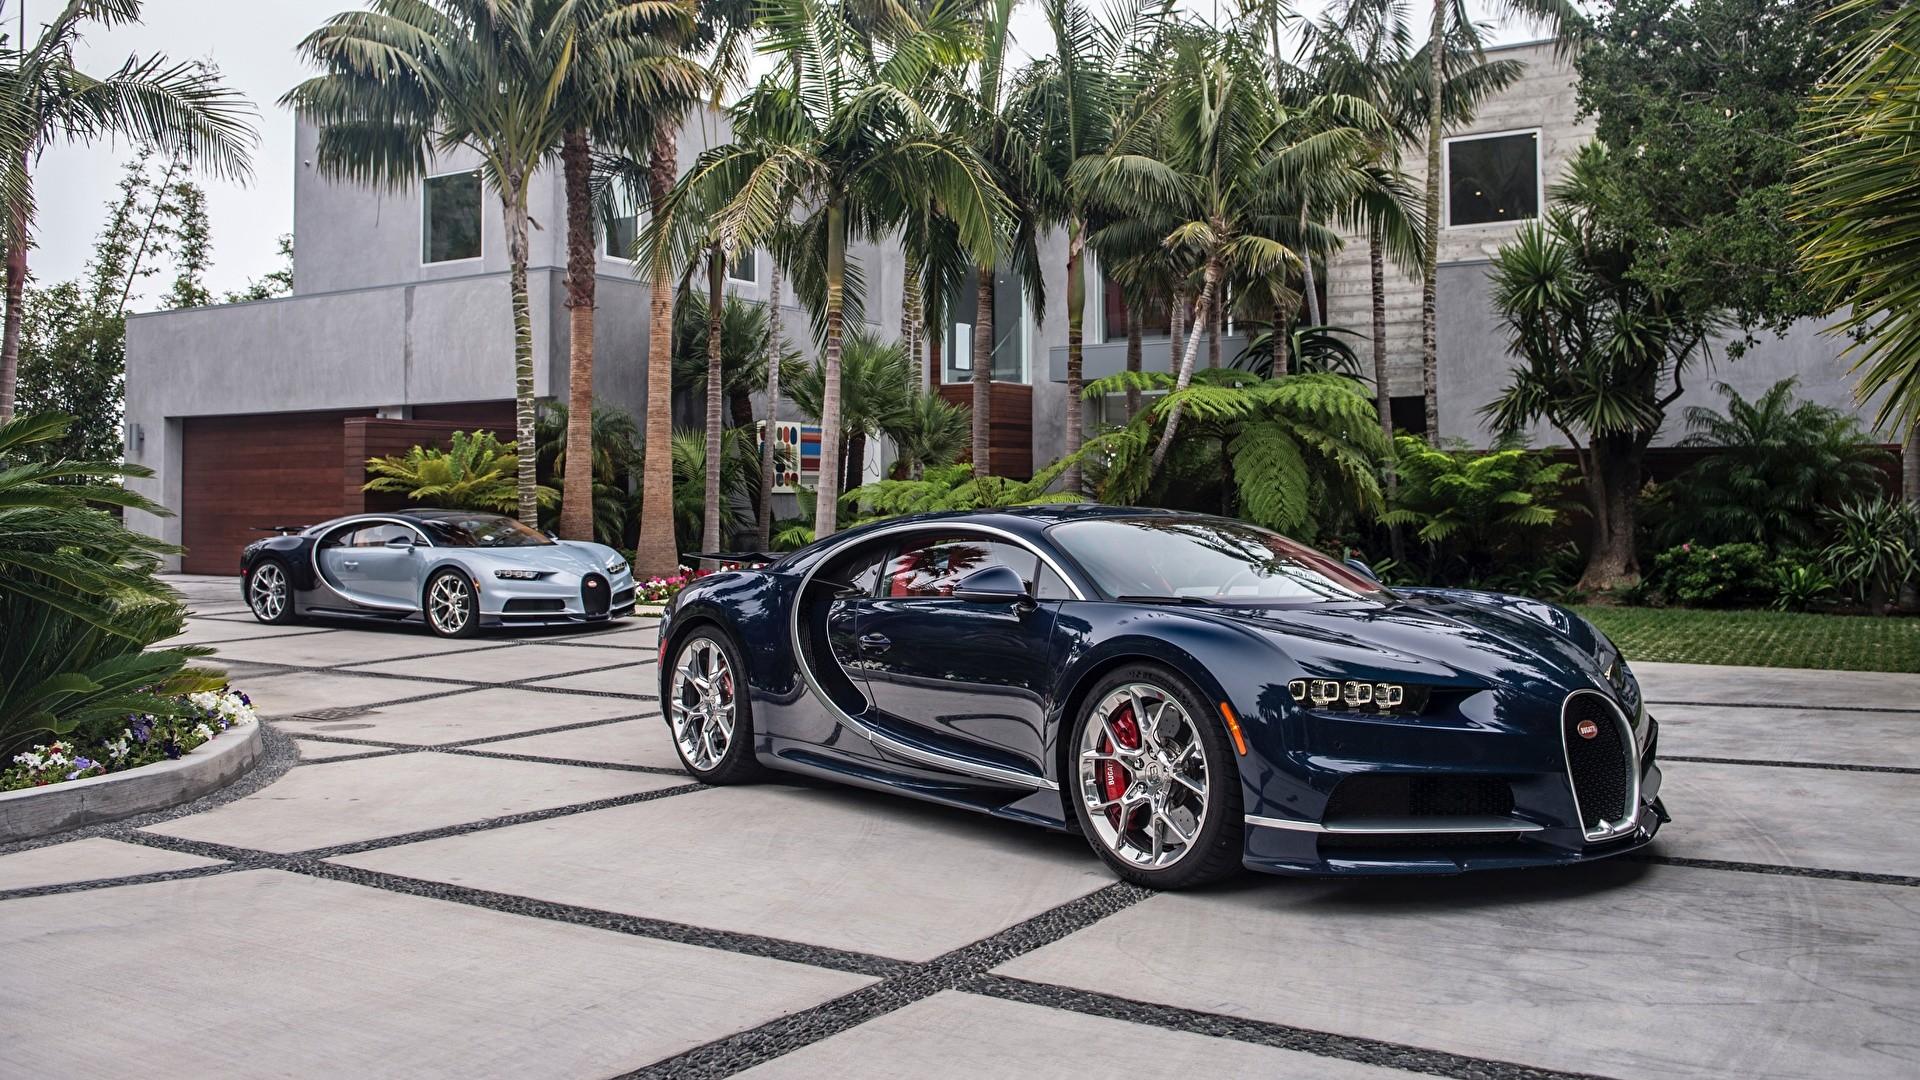 Bugatti Chiron full hd wallpaper for laptop